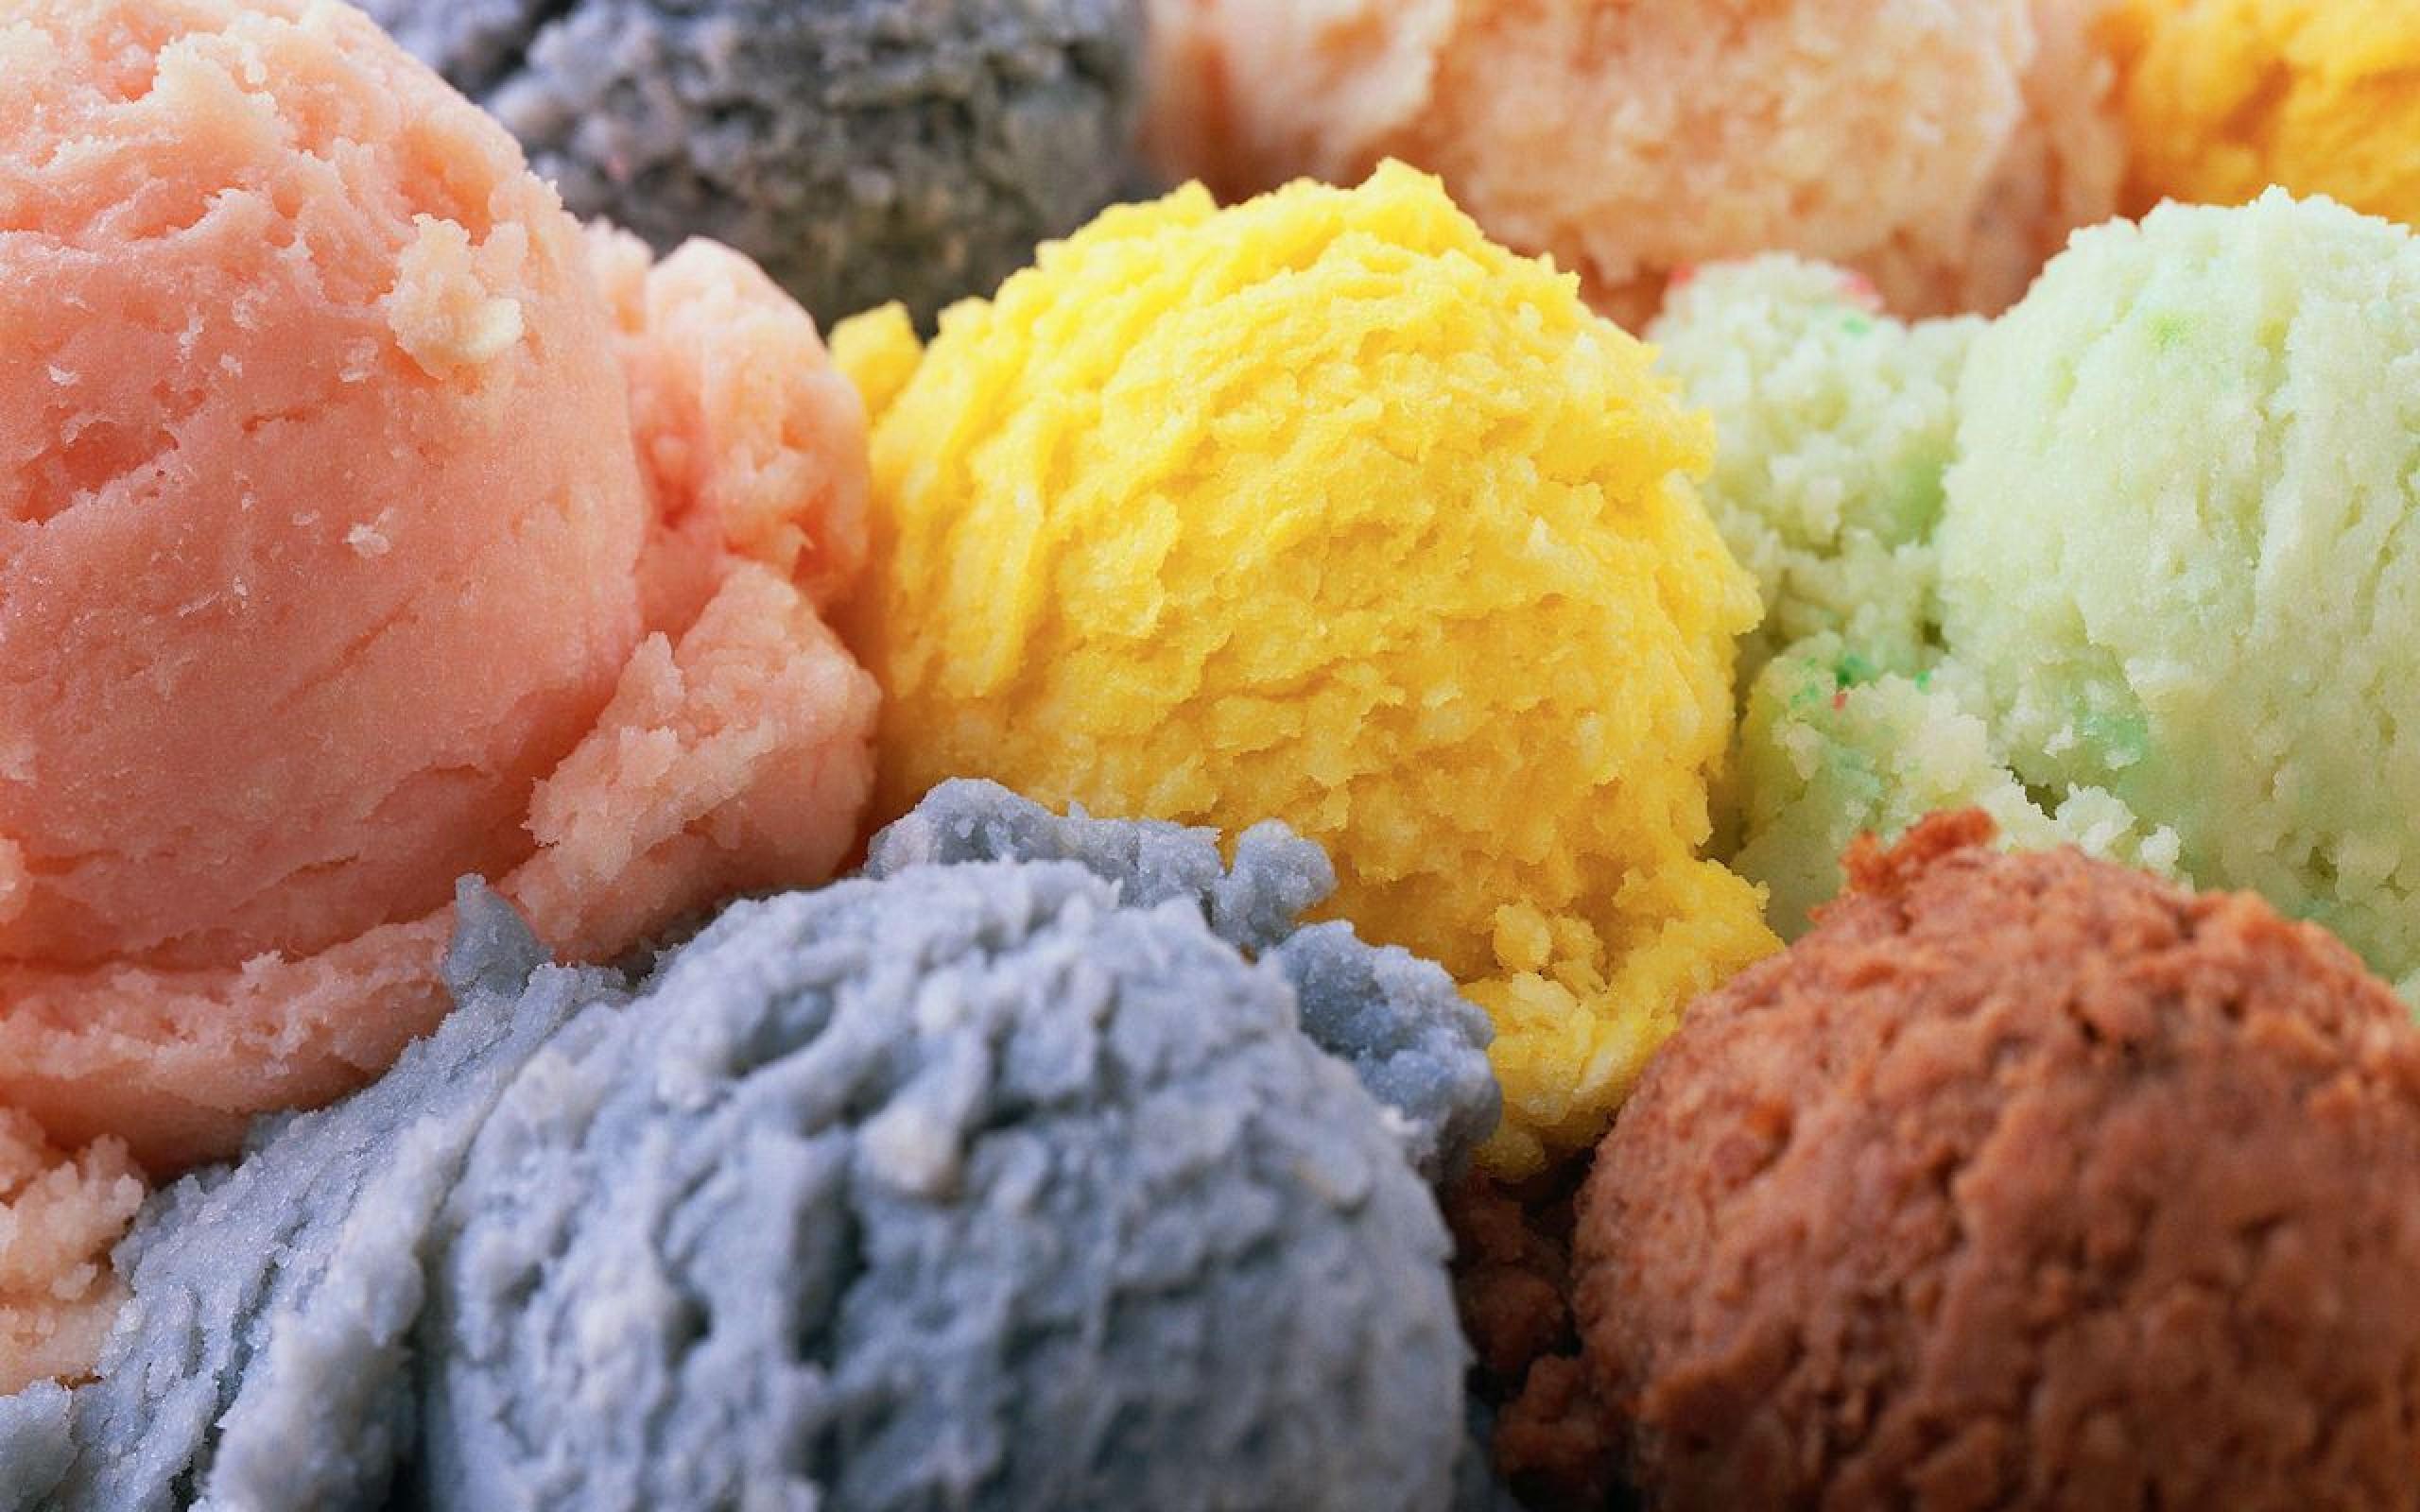 images of ice cream wallpaper - photo #9